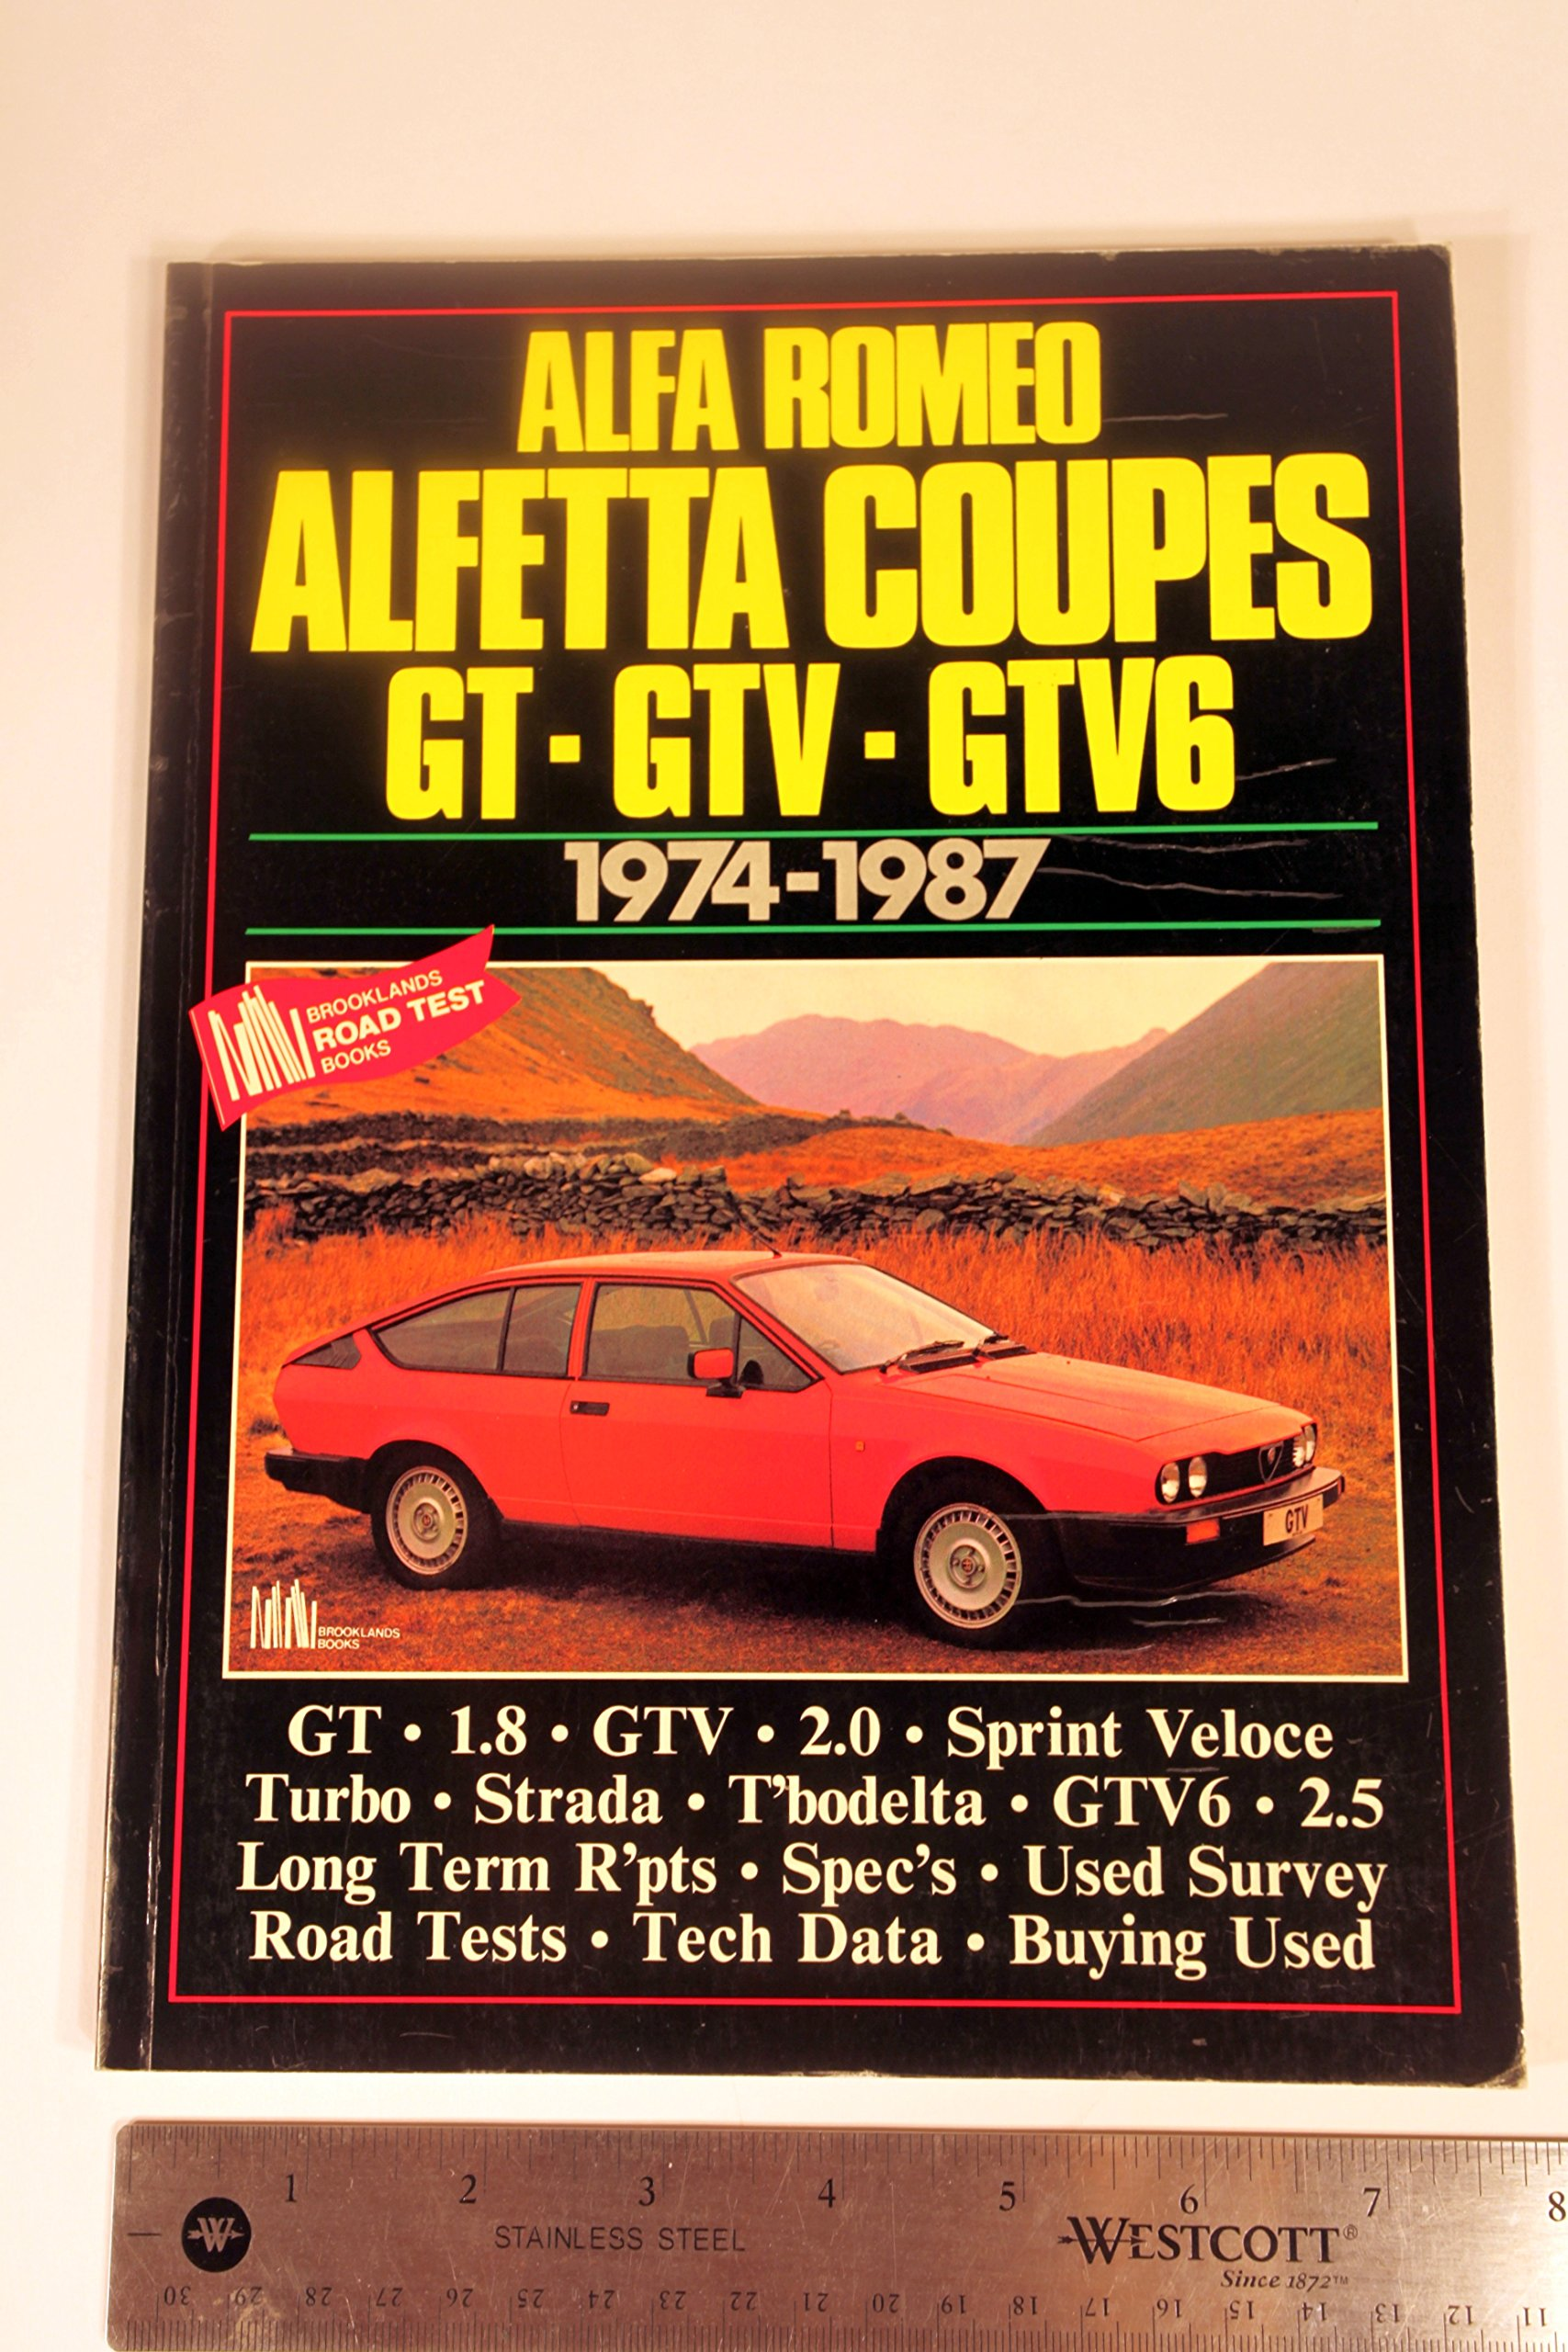 Alfa Romeo Alfetta Coupes, 1974-87 (Brooklands Books Road Tests Series) Paperback – September, 1988